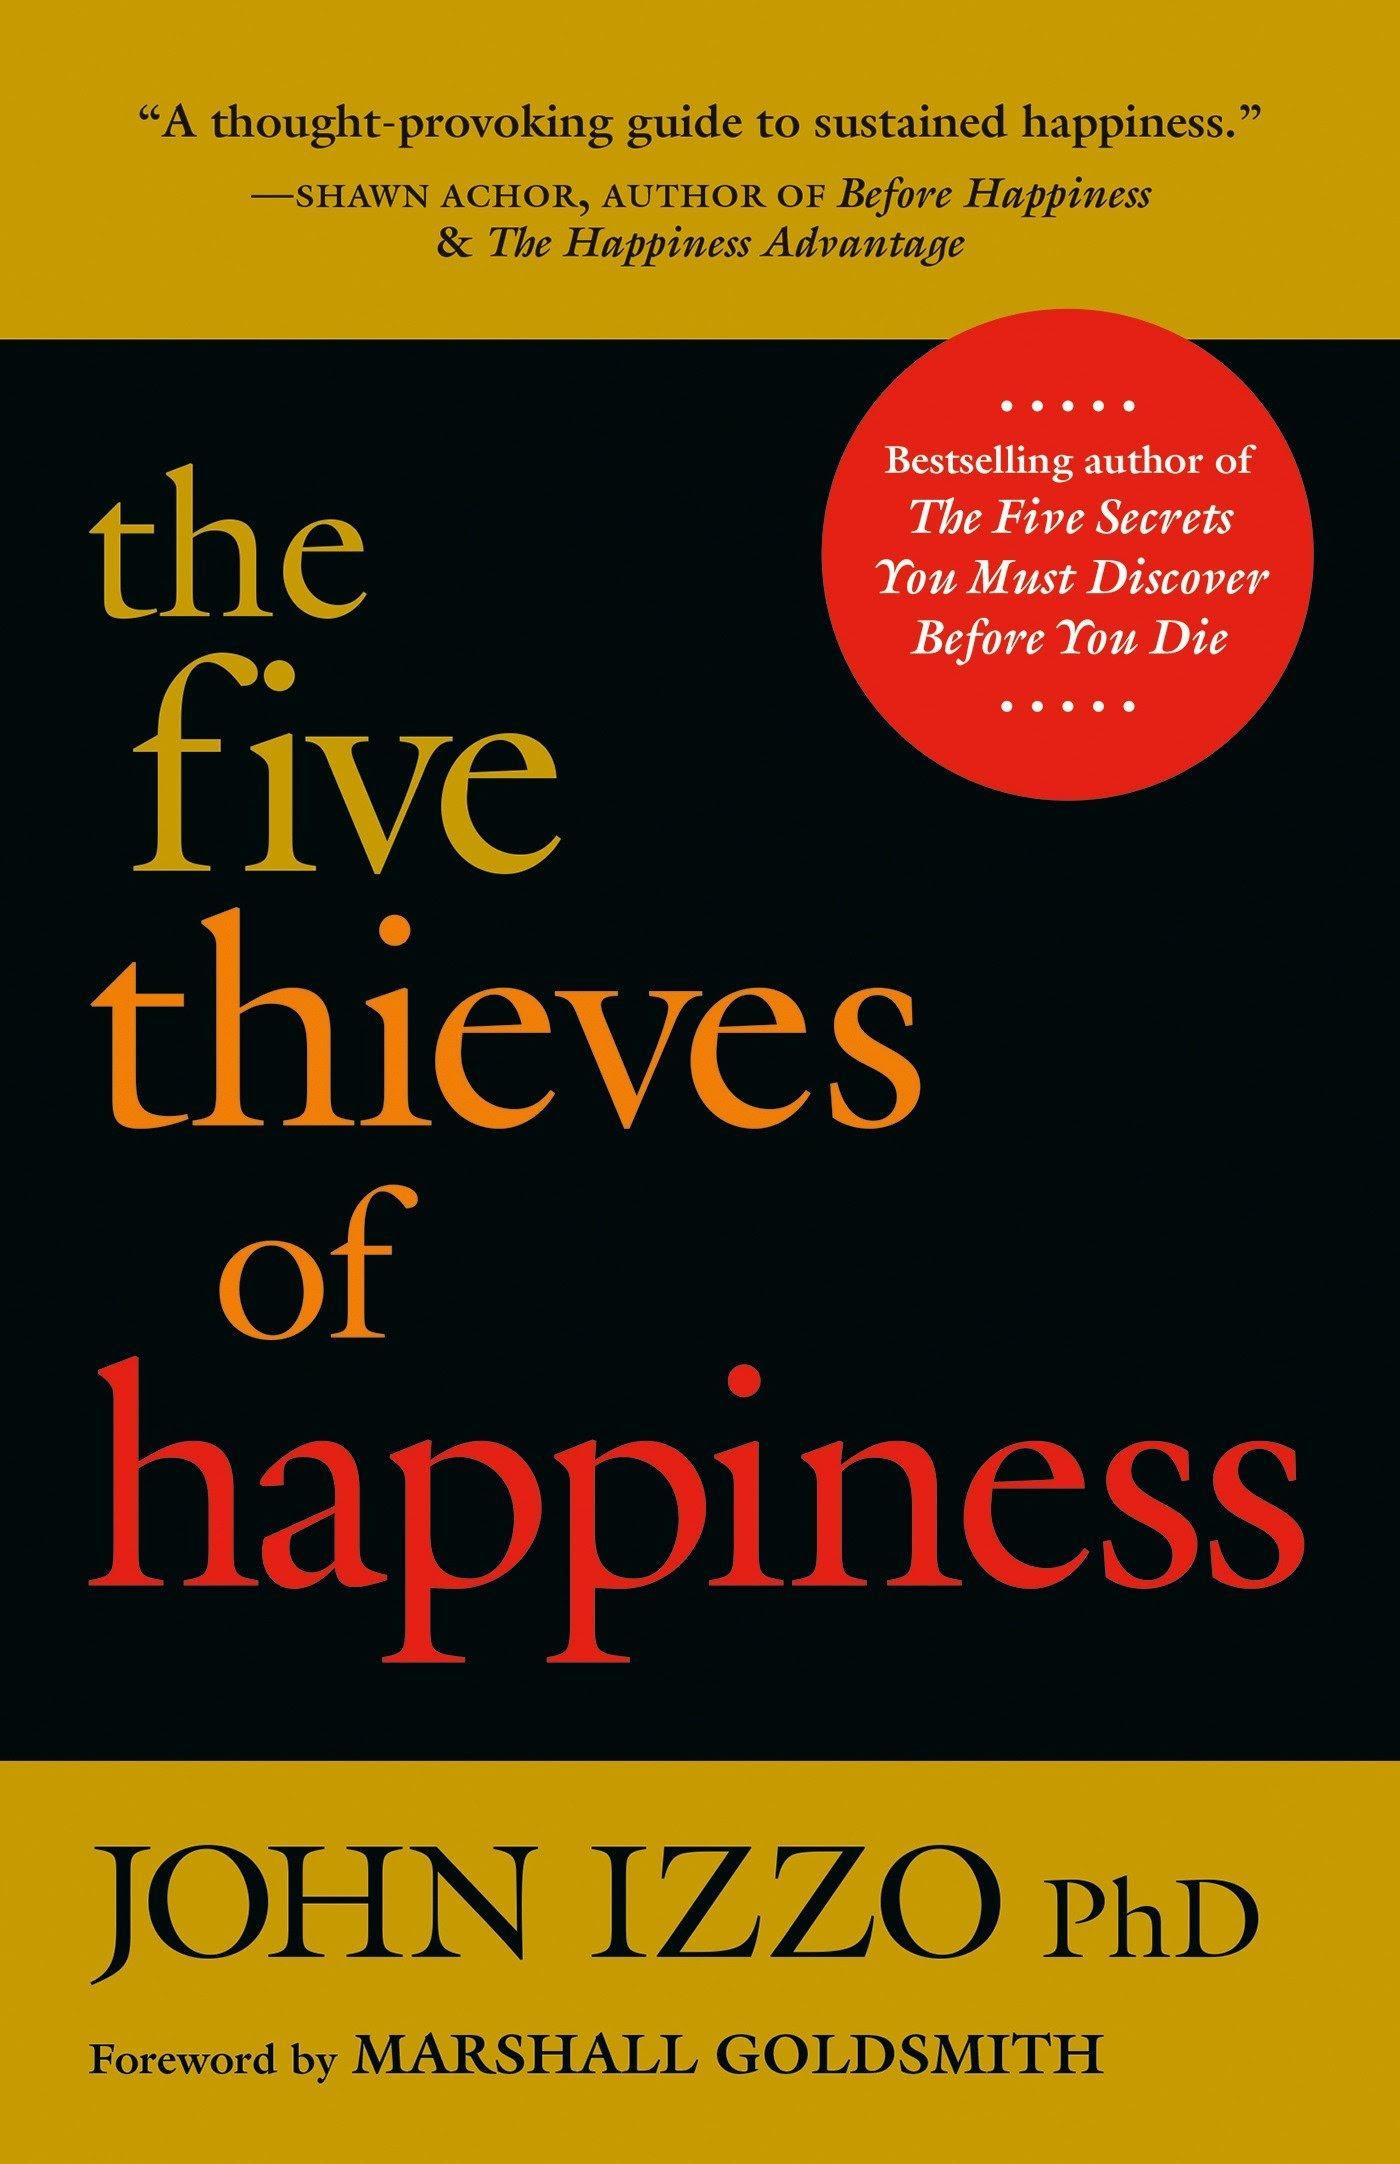 Five Thieves of Happiness, John Izzo: Book summary